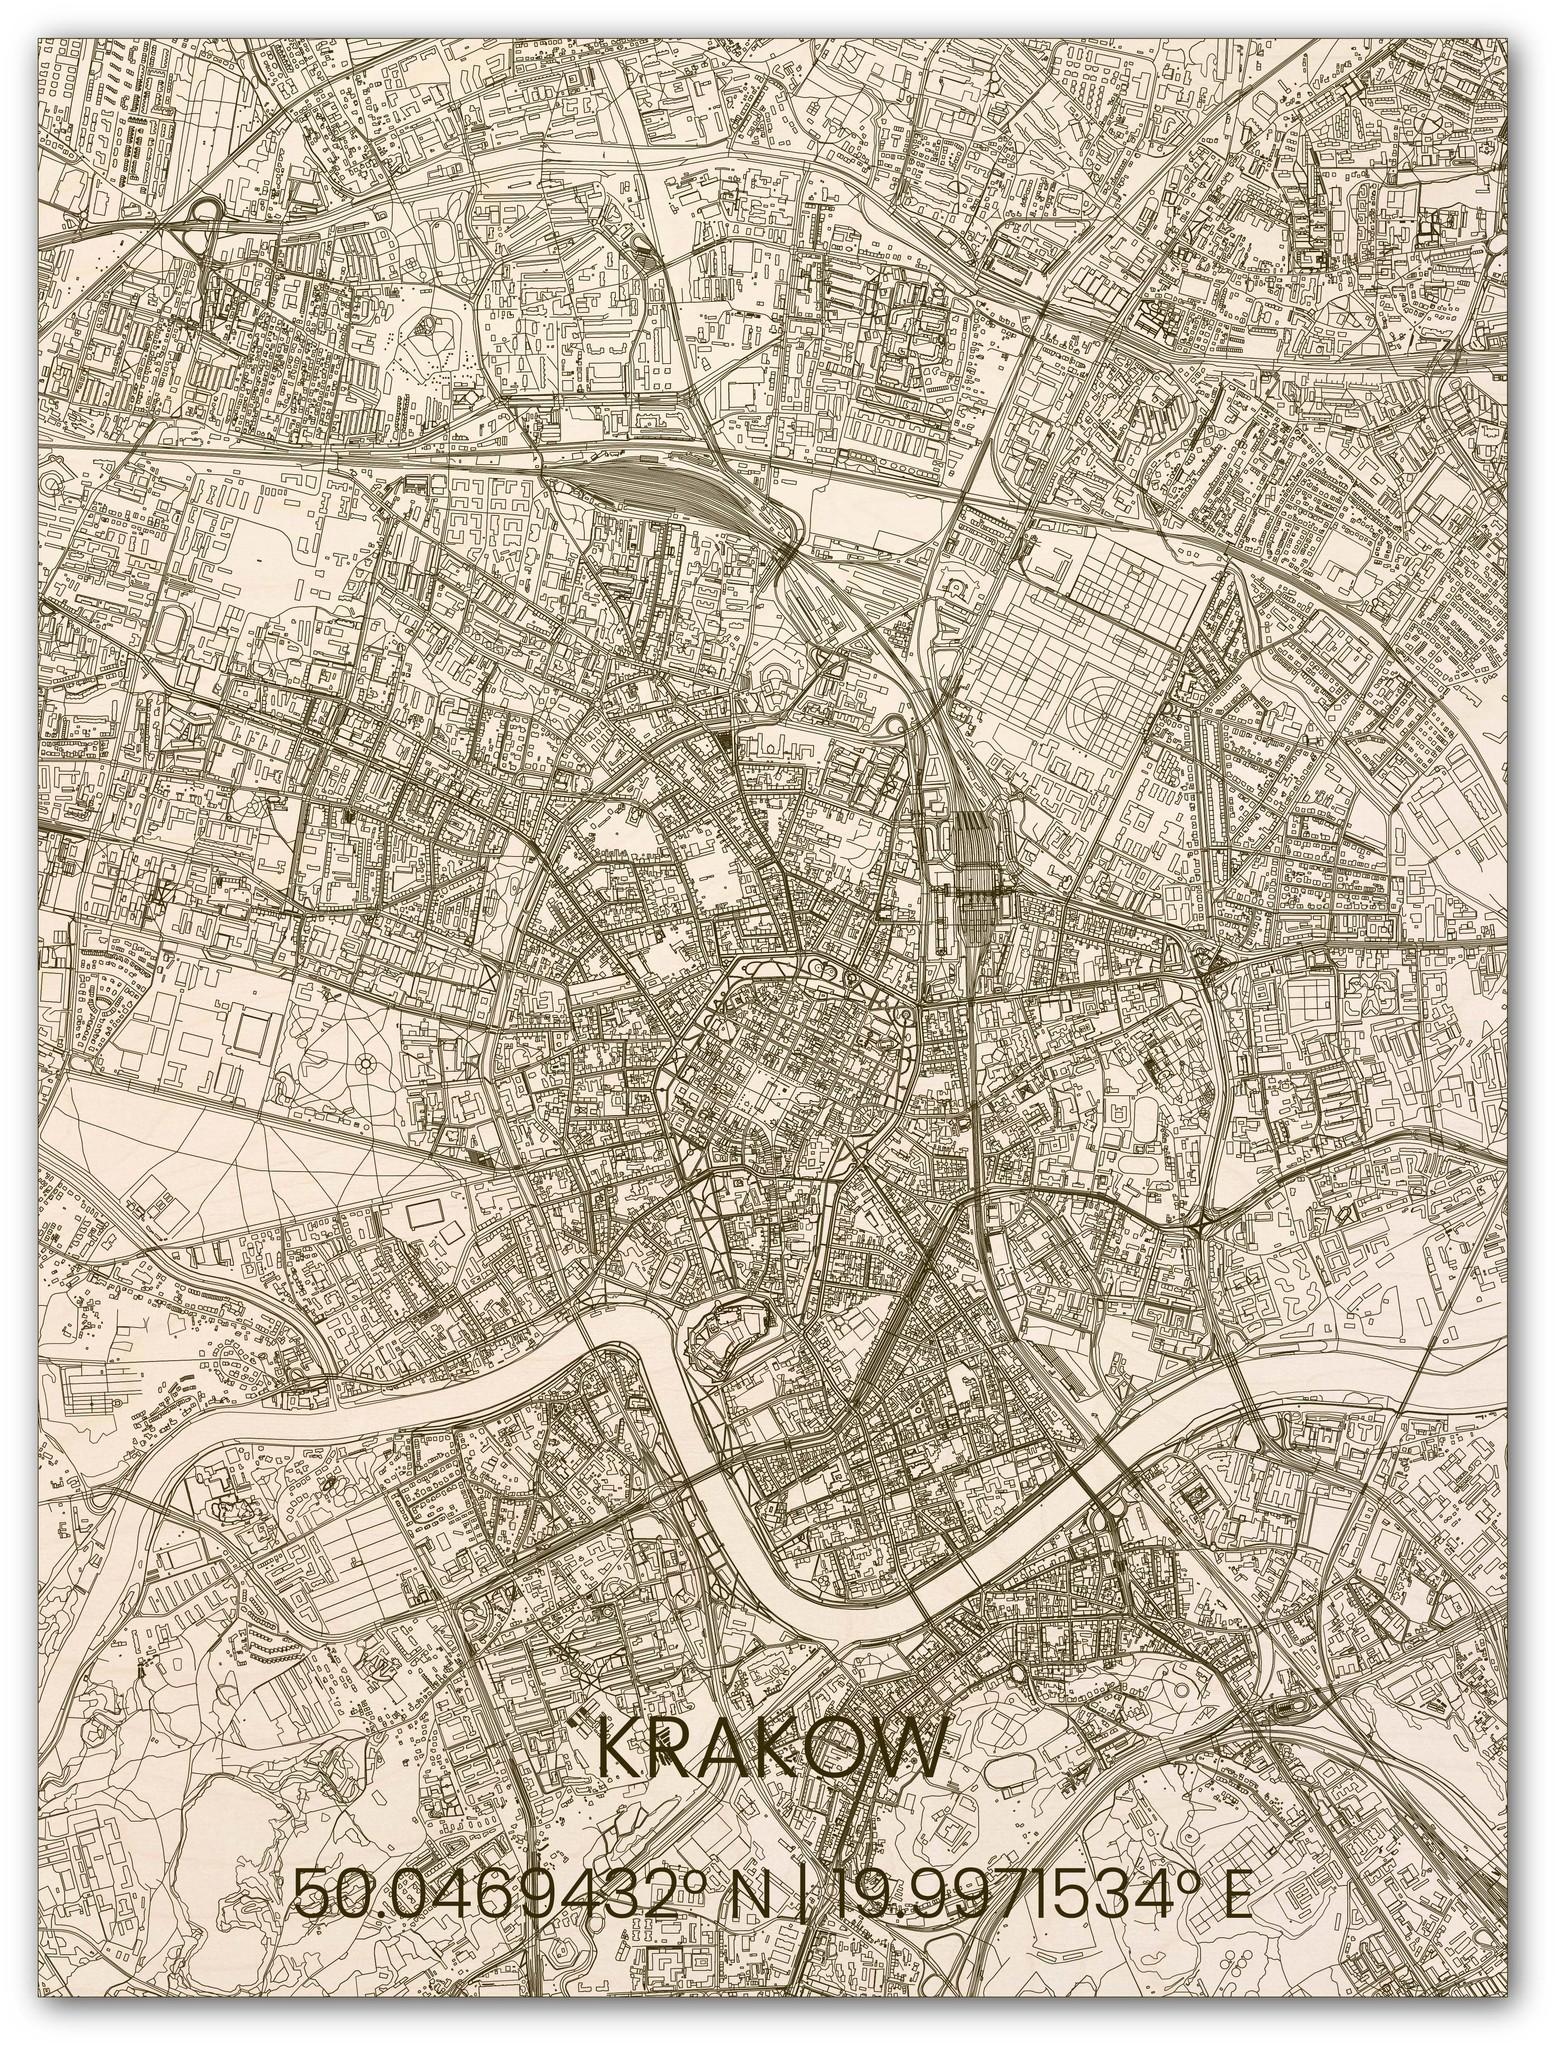 Houten stadsplattegrond Krakau-1